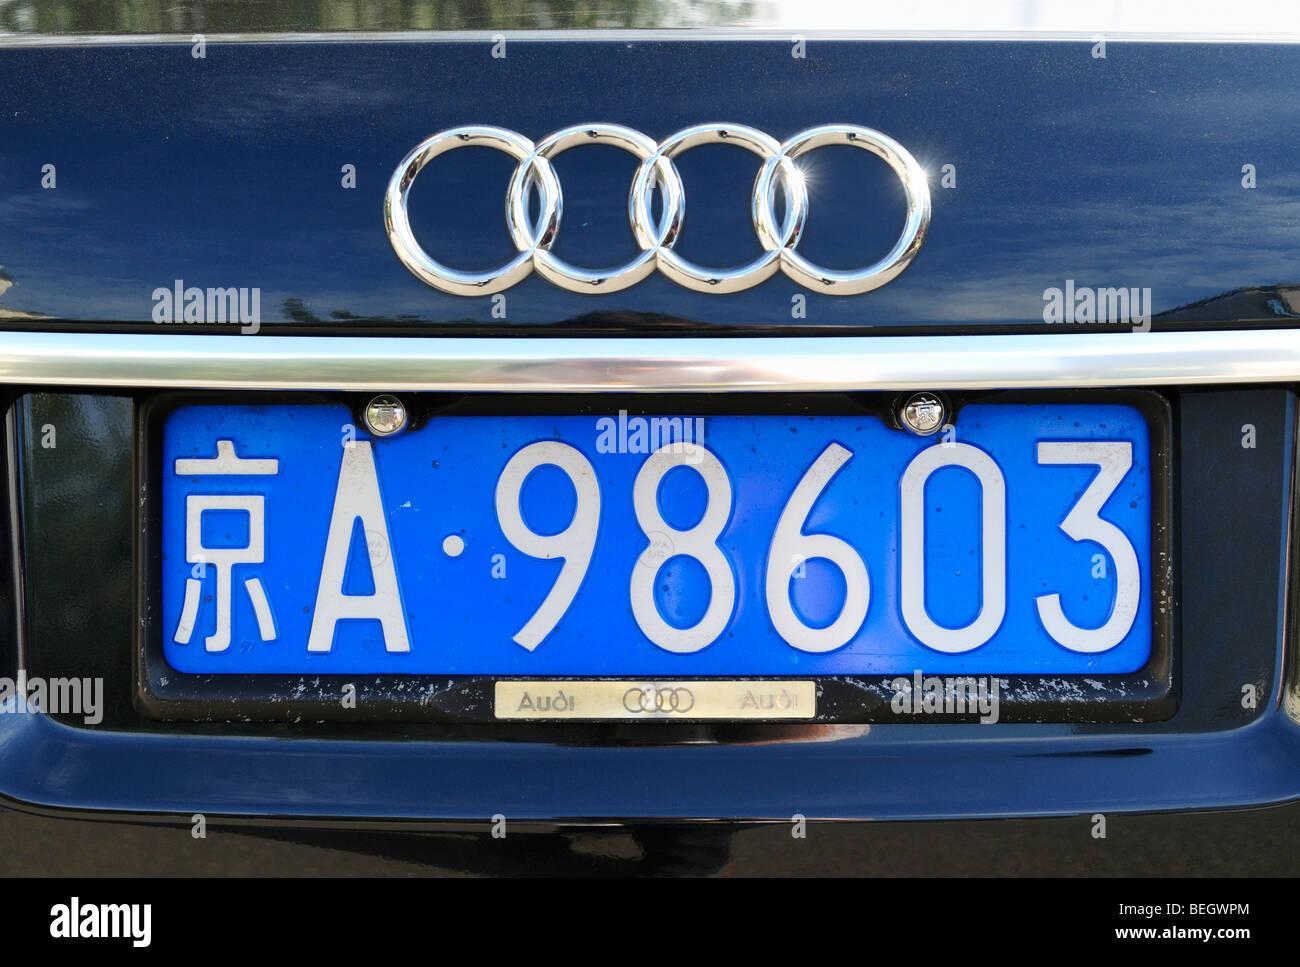 Car Number Plate On An Audi Limousine Beijing CN Stock Photo - Audi car number